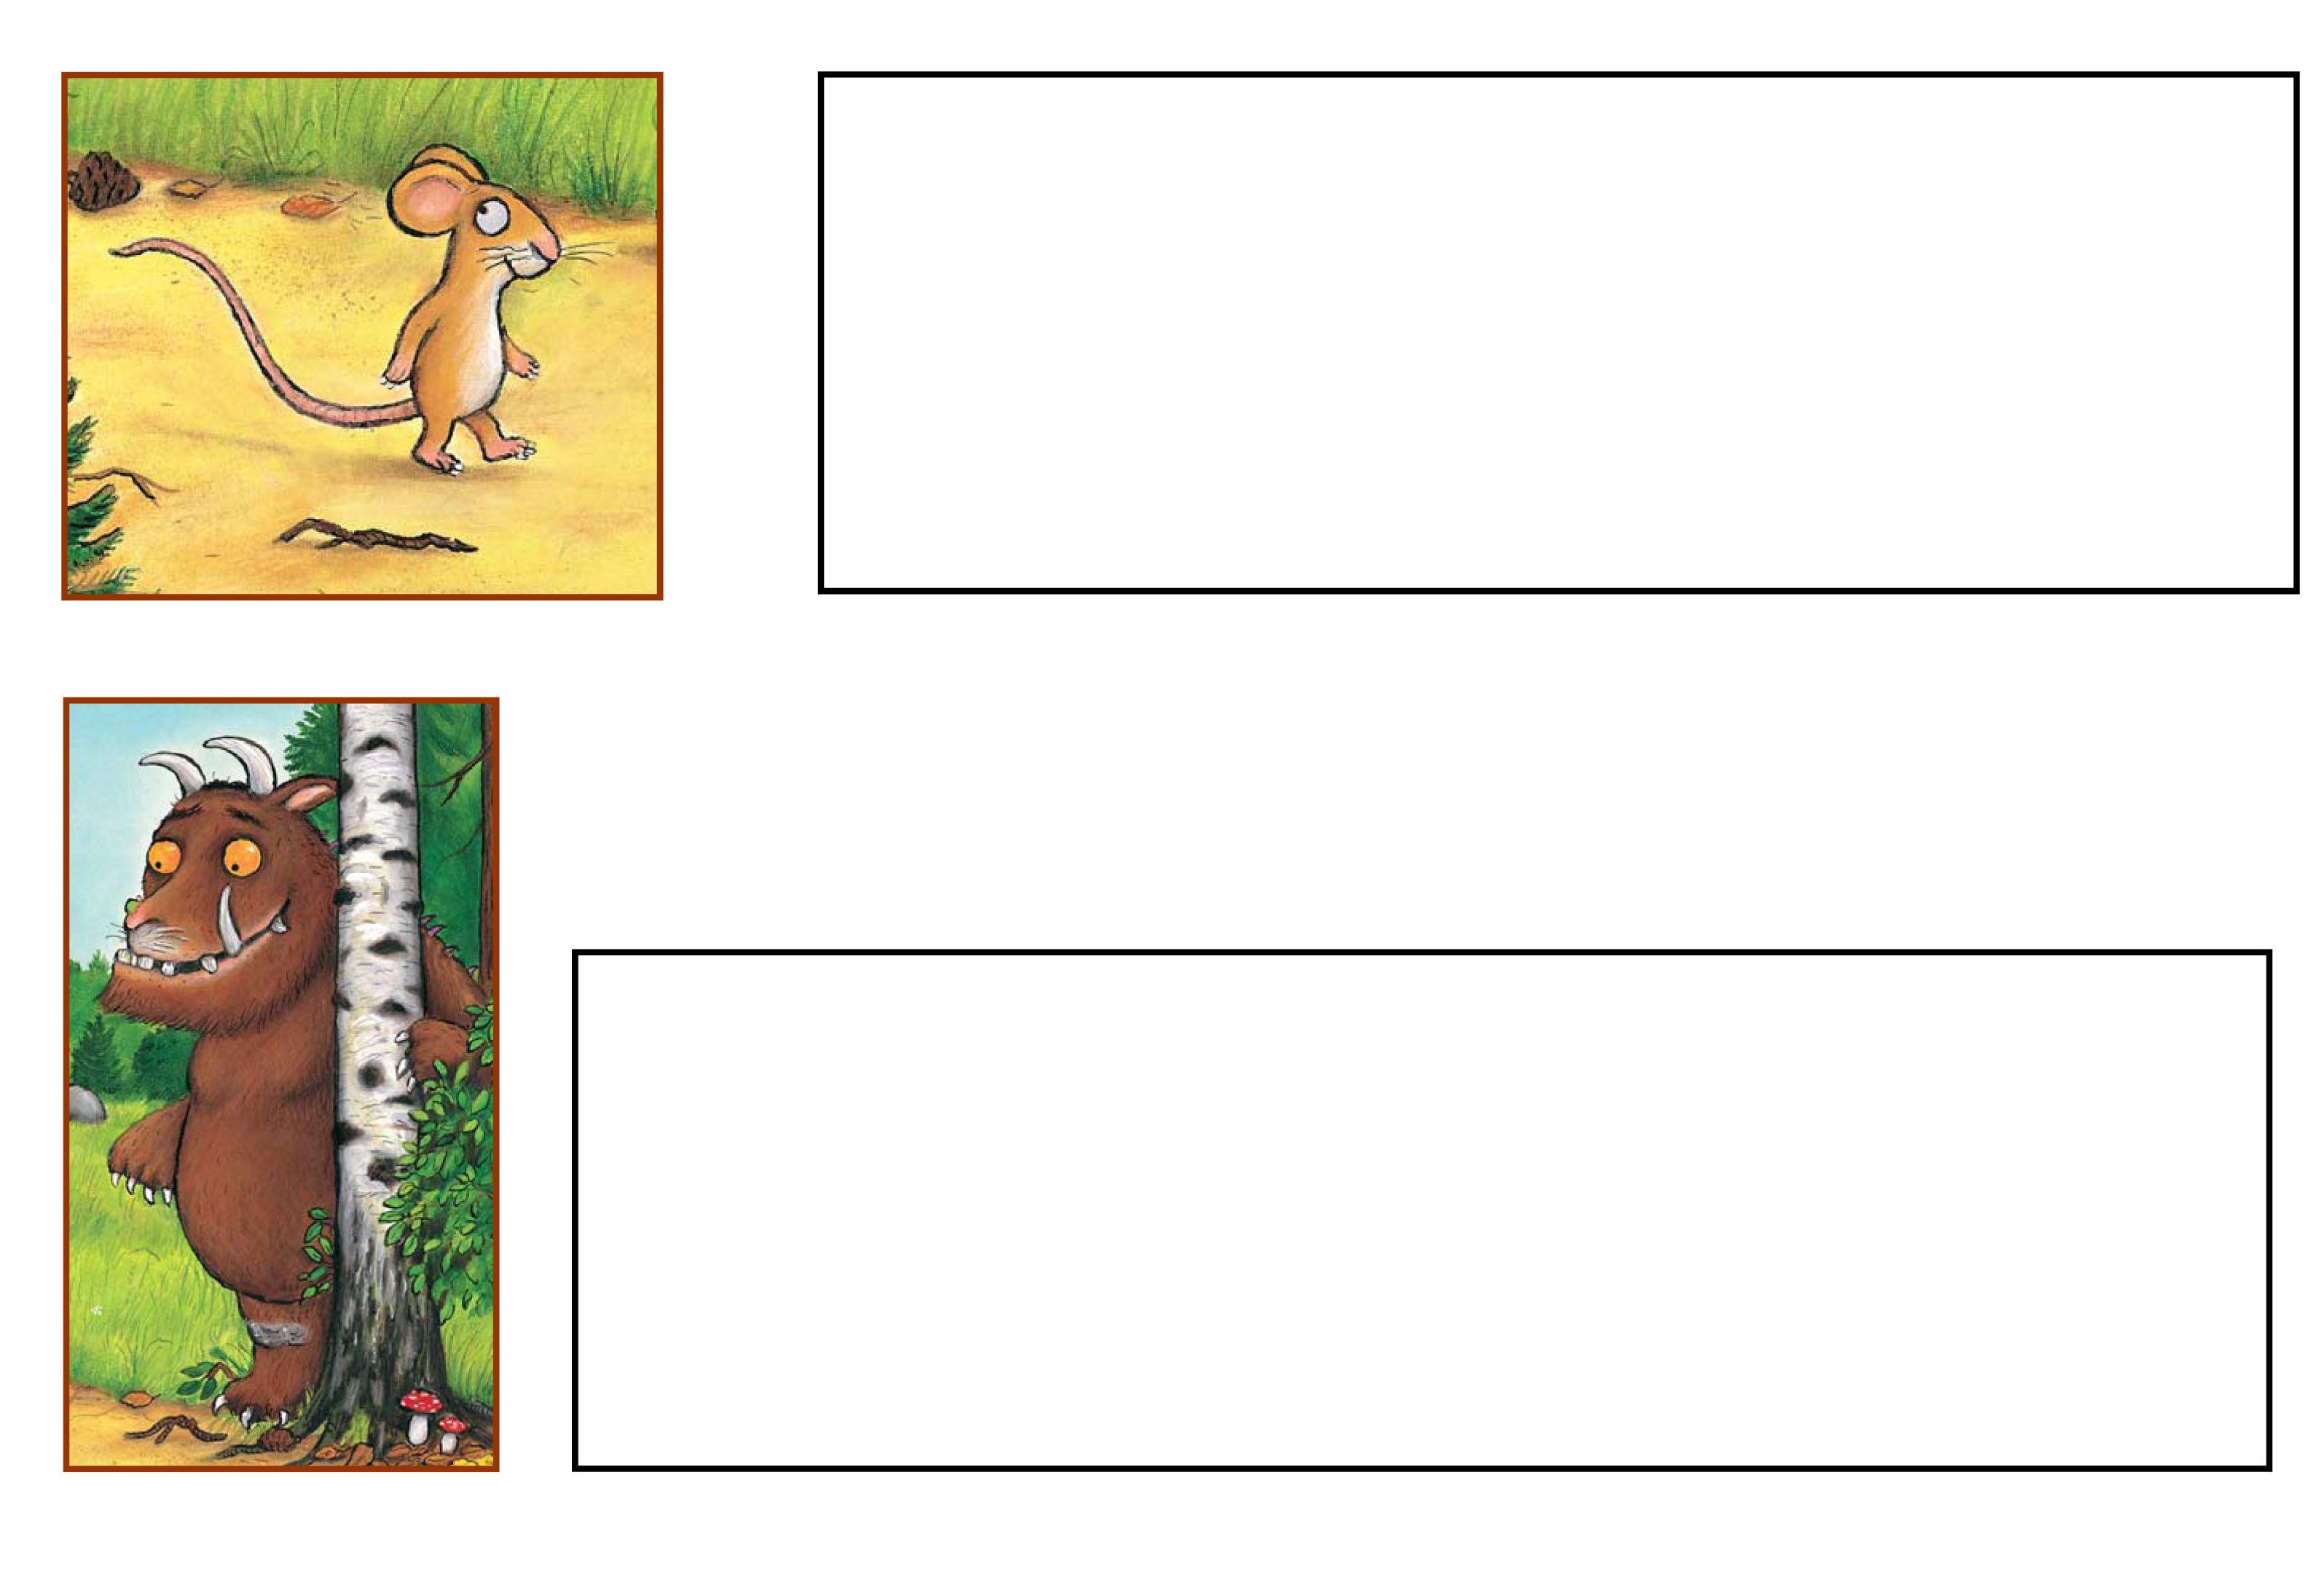 Stempelen De Gruffalo 5 5